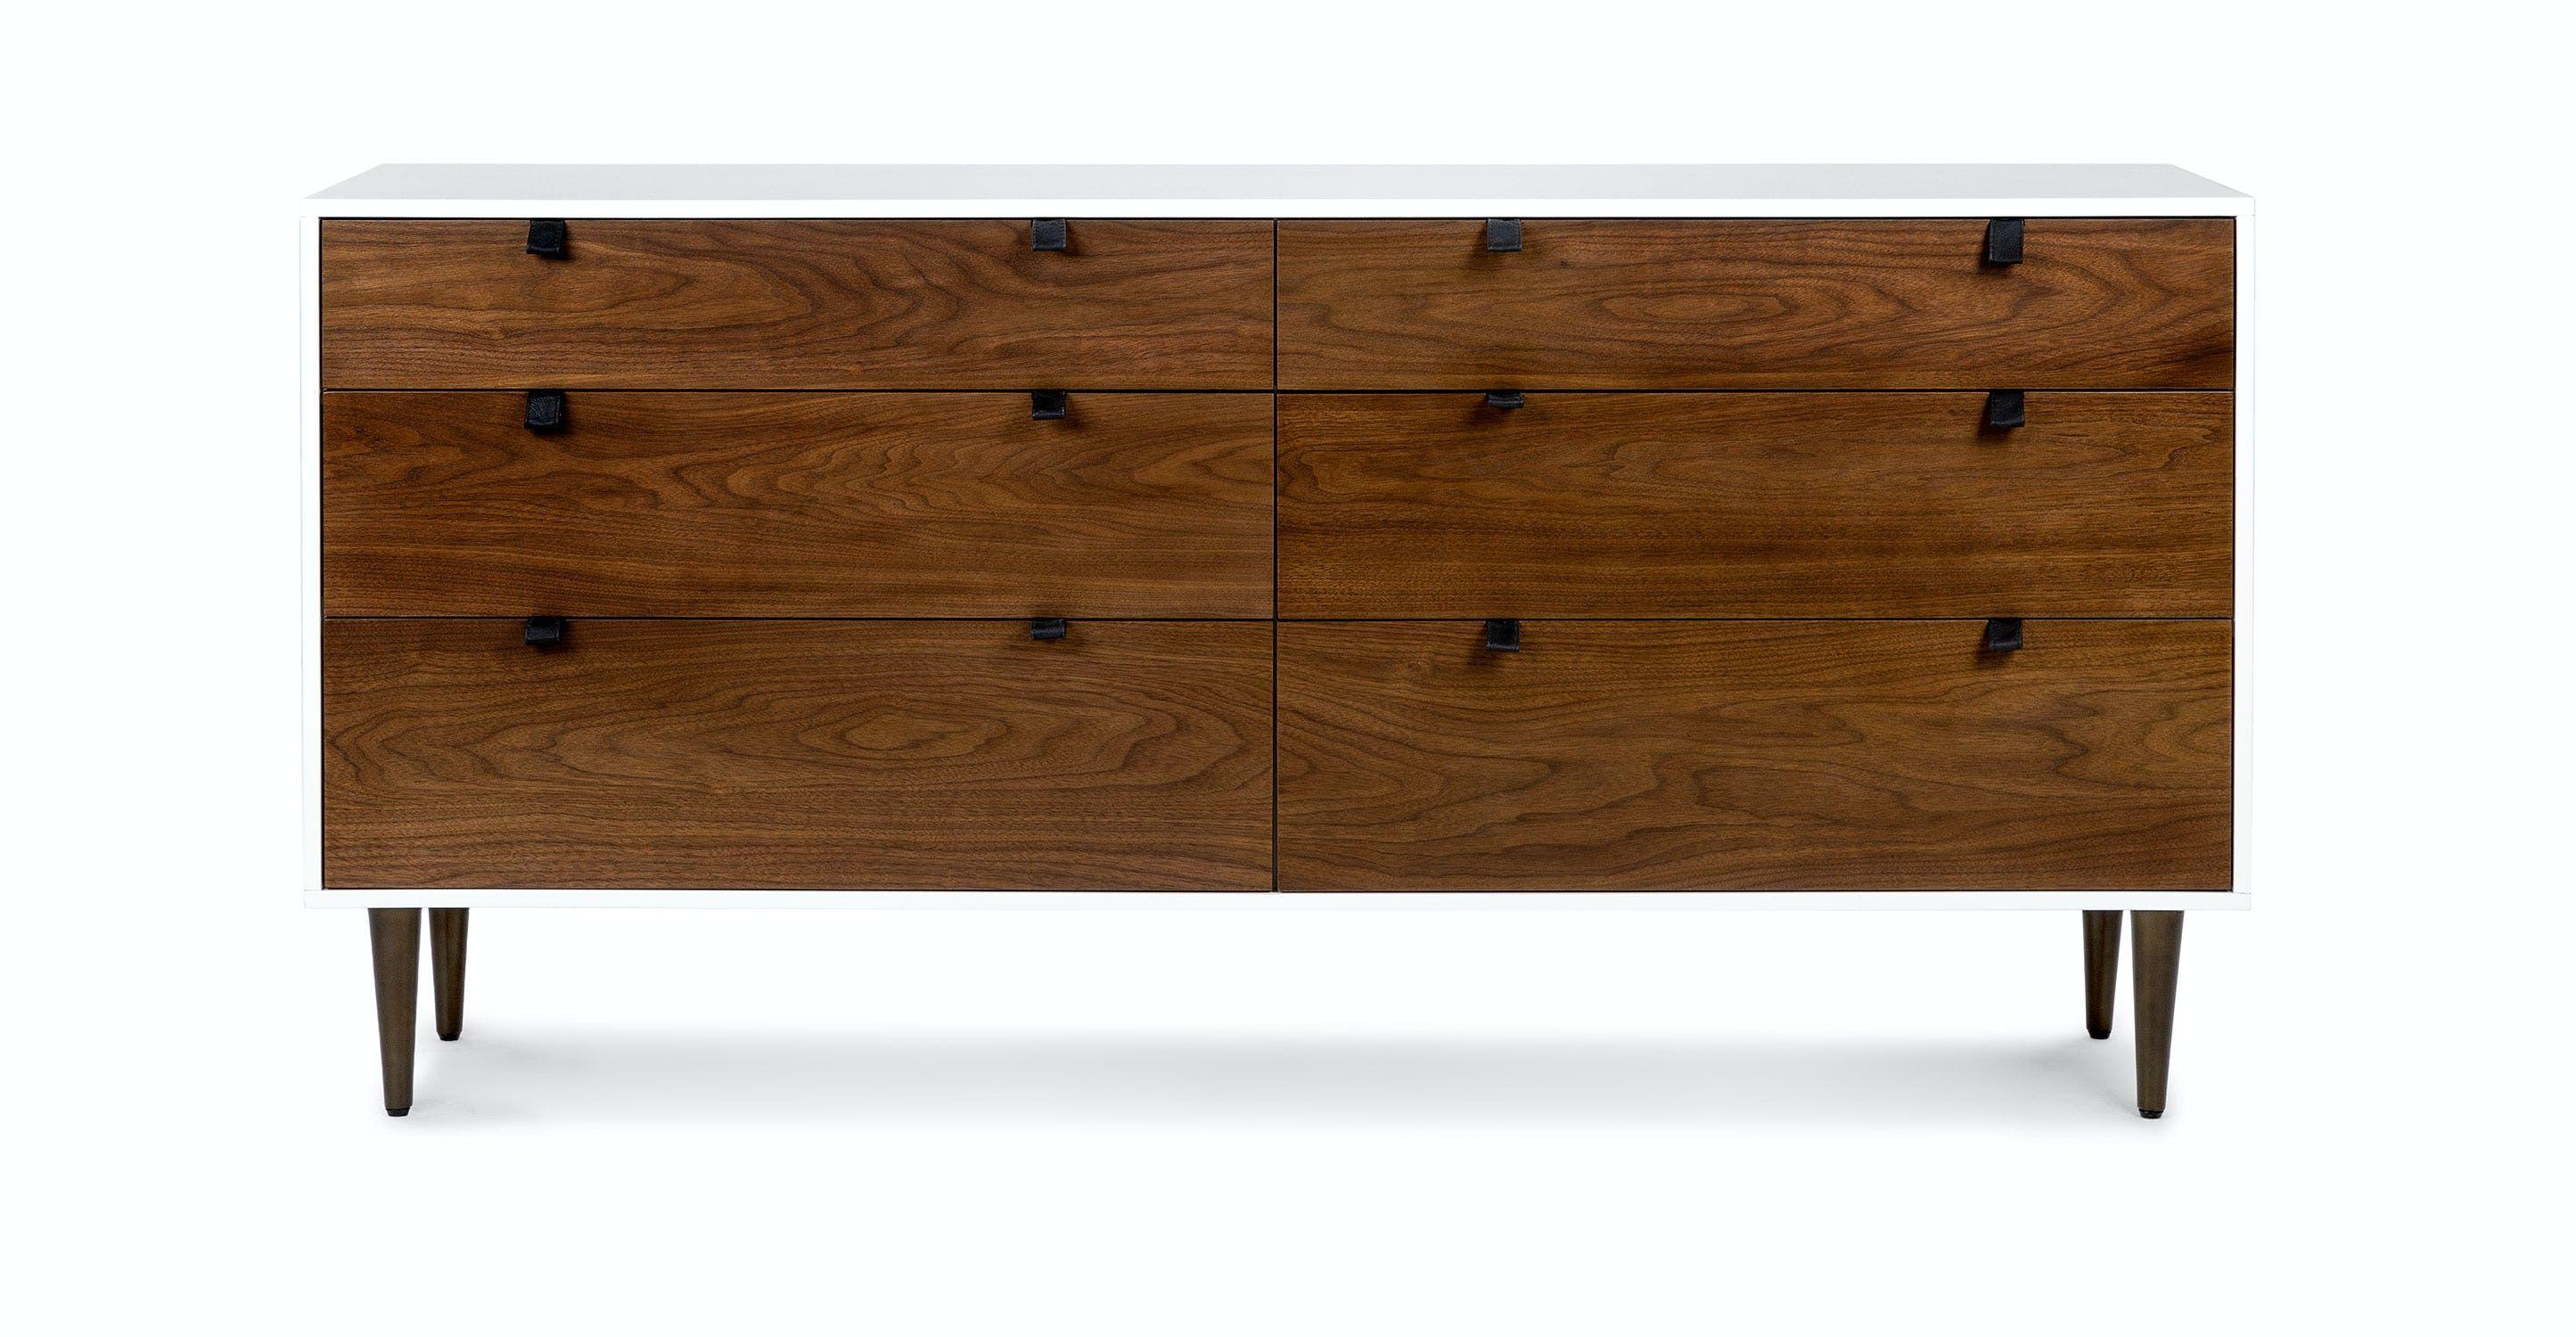 Envelo White Walnut 6 Drawer Double Dresser Dormitorio Contemporaneo Diseno De Muebles Muebles [ 1500 x 2890 Pixel ]